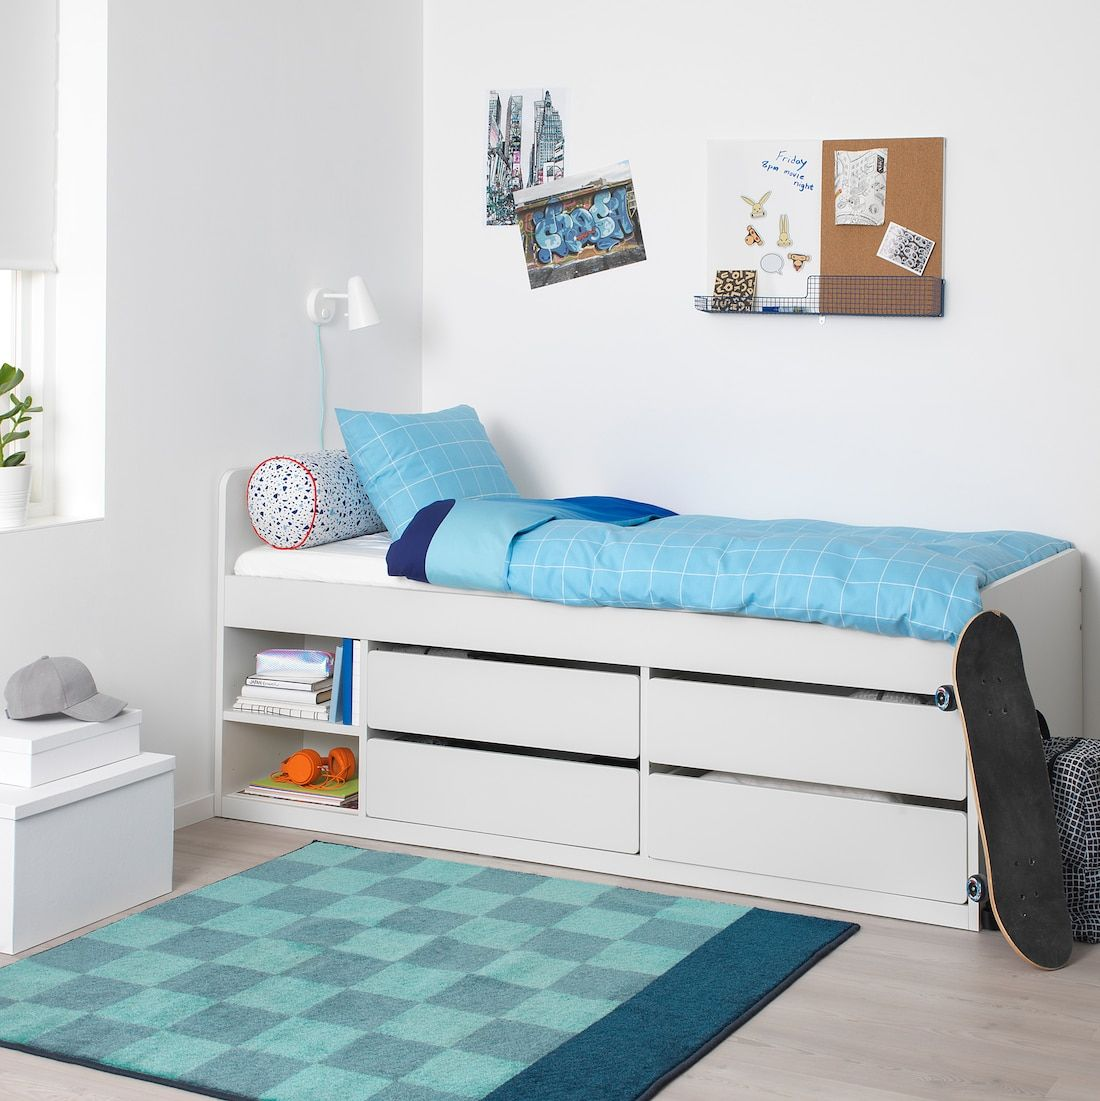 SLÄKT Bed frame w/storage+slatted bedbase, white, Twin